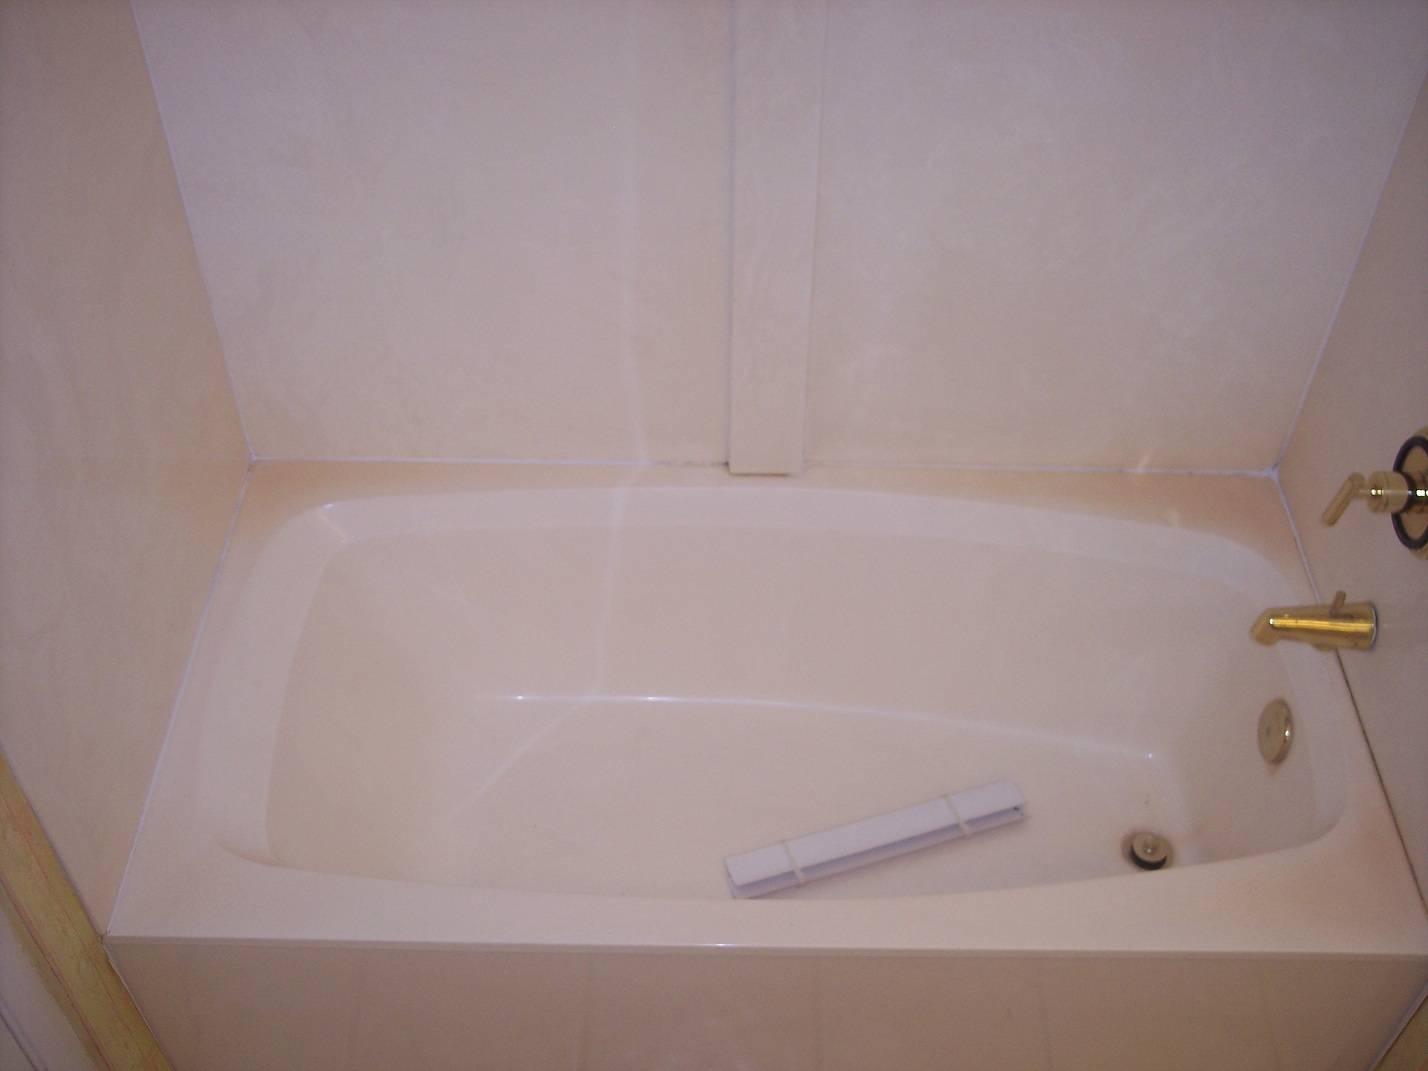 Old Tub.